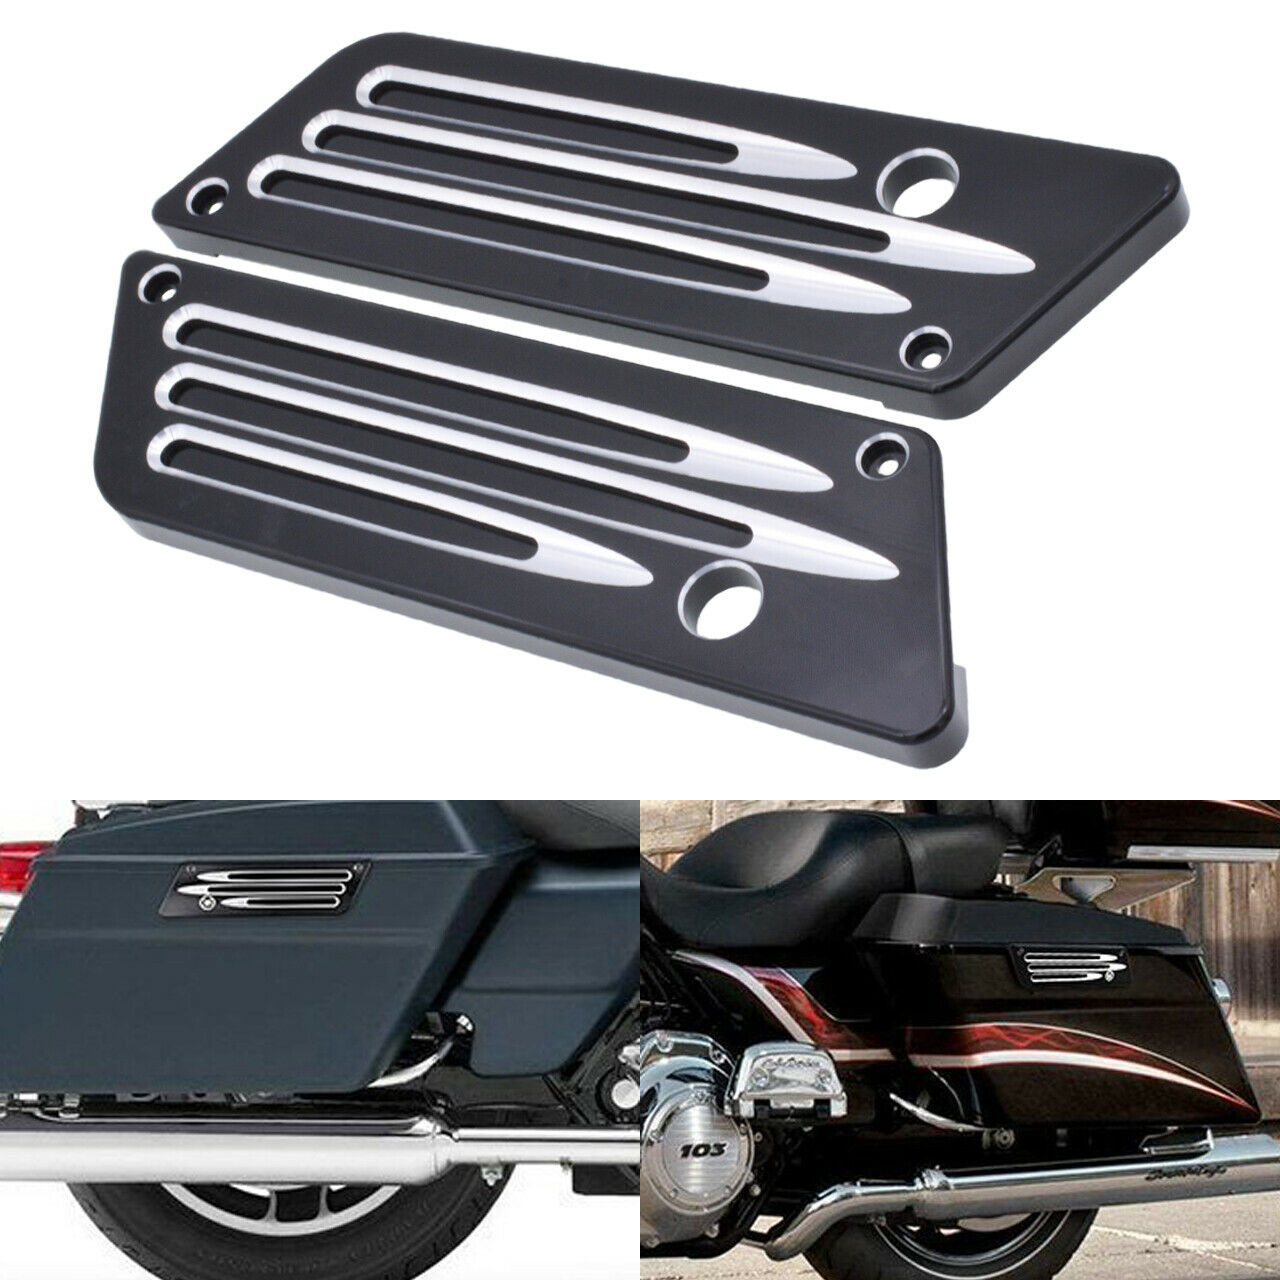 Black Aluminum CNC Hard Saddlebag Latch Cover For Harley 1993-2013 Touring FLHT